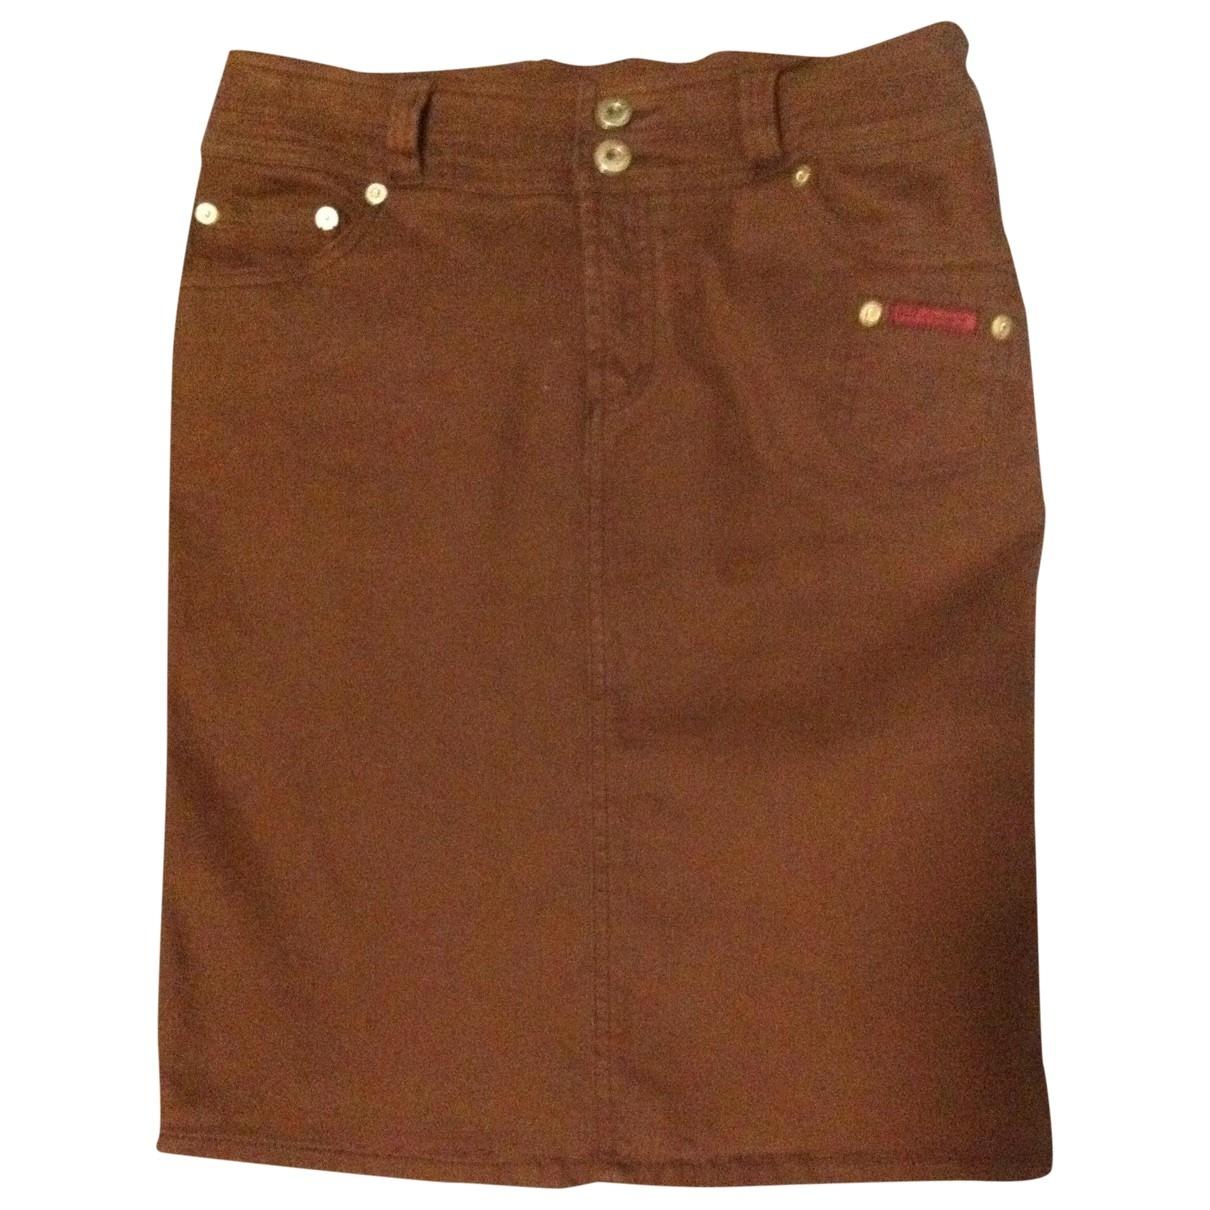 D&g \N Brown Cotton skirt for Women 40 IT